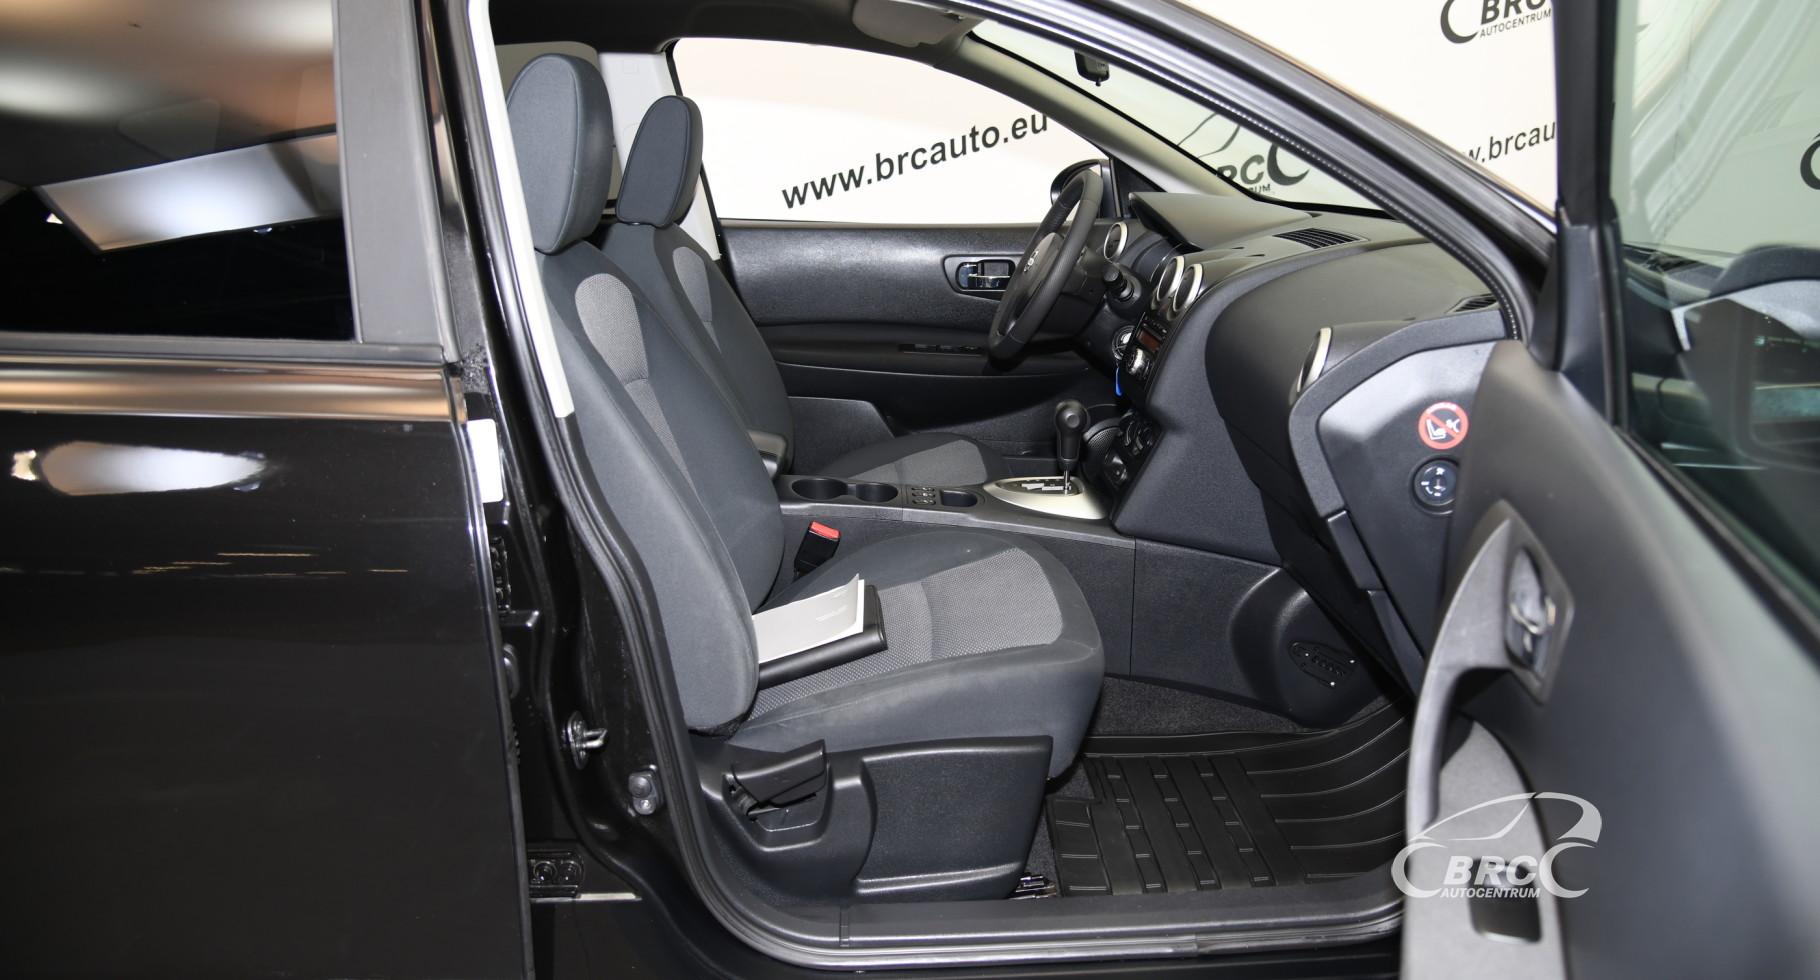 Nissan Qashqai 2.0 2WD Automatas